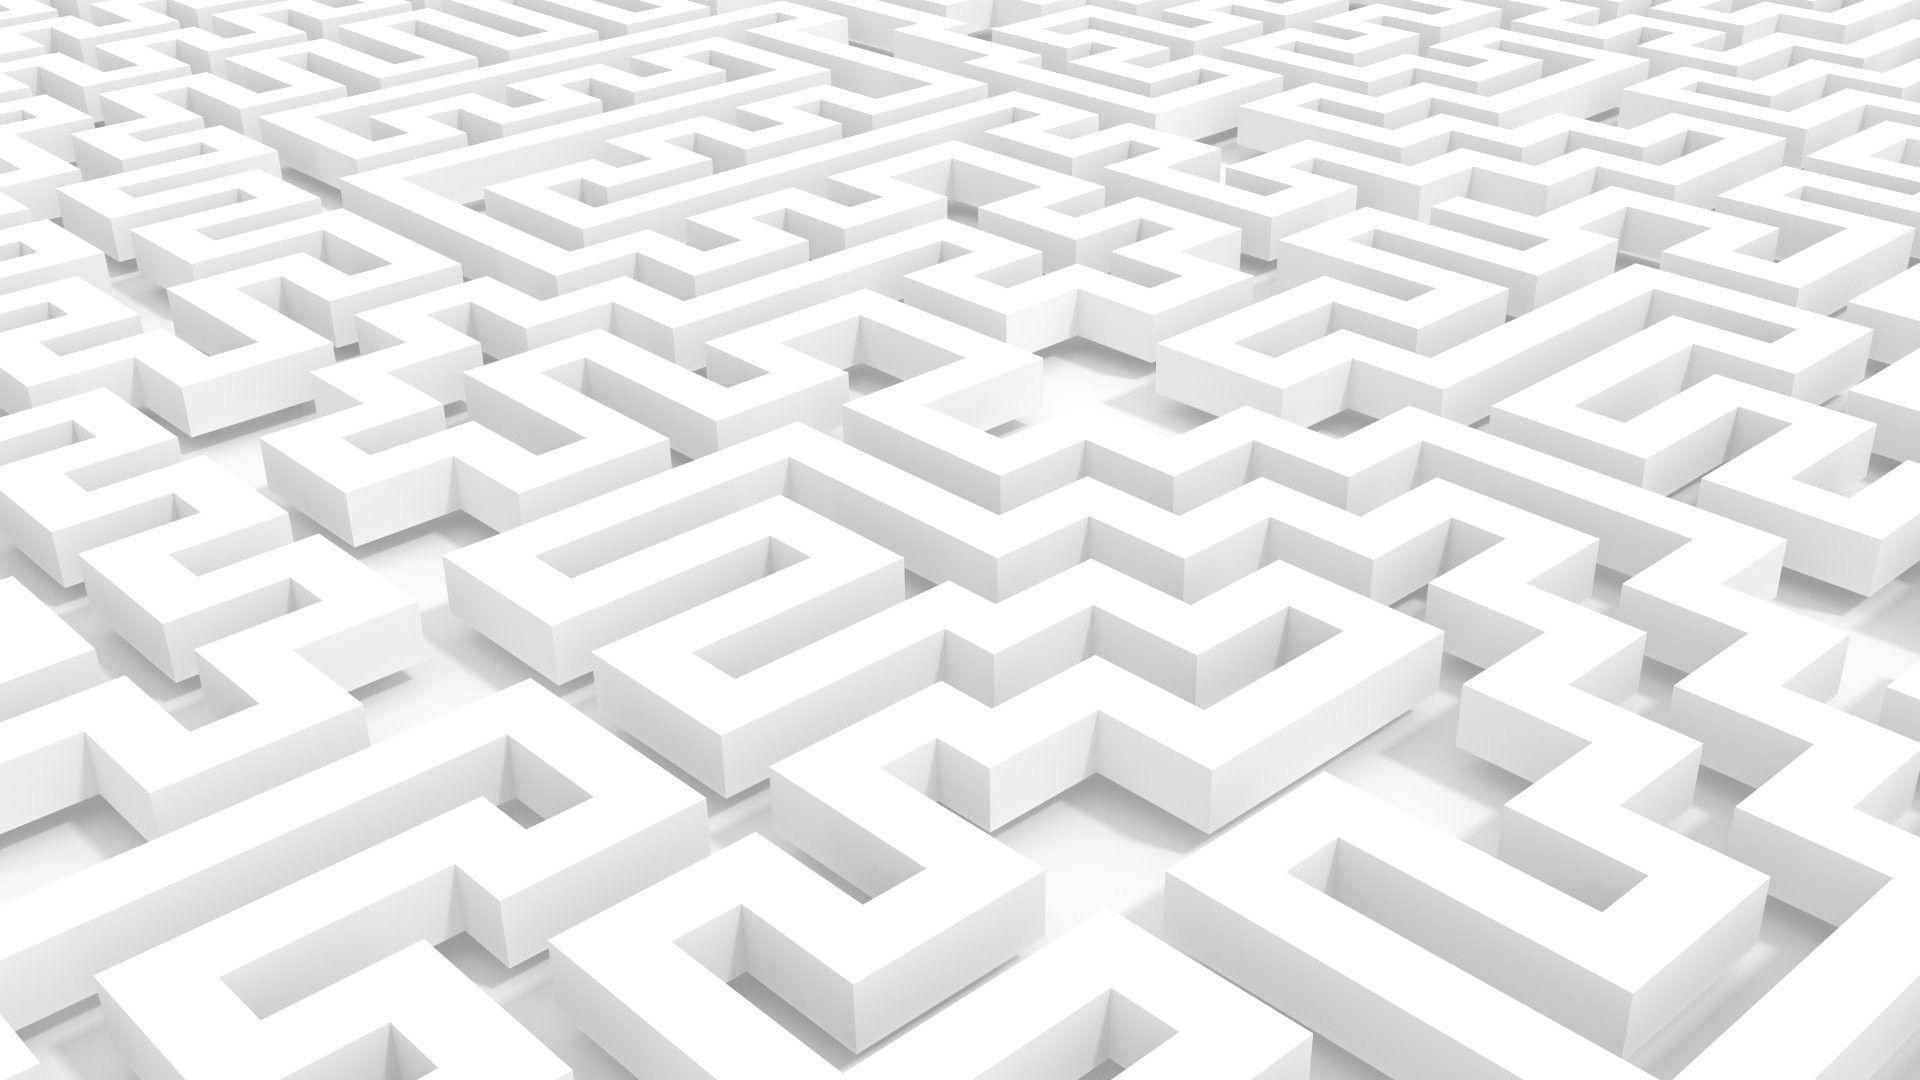 Labyrinth Wallpaper Download